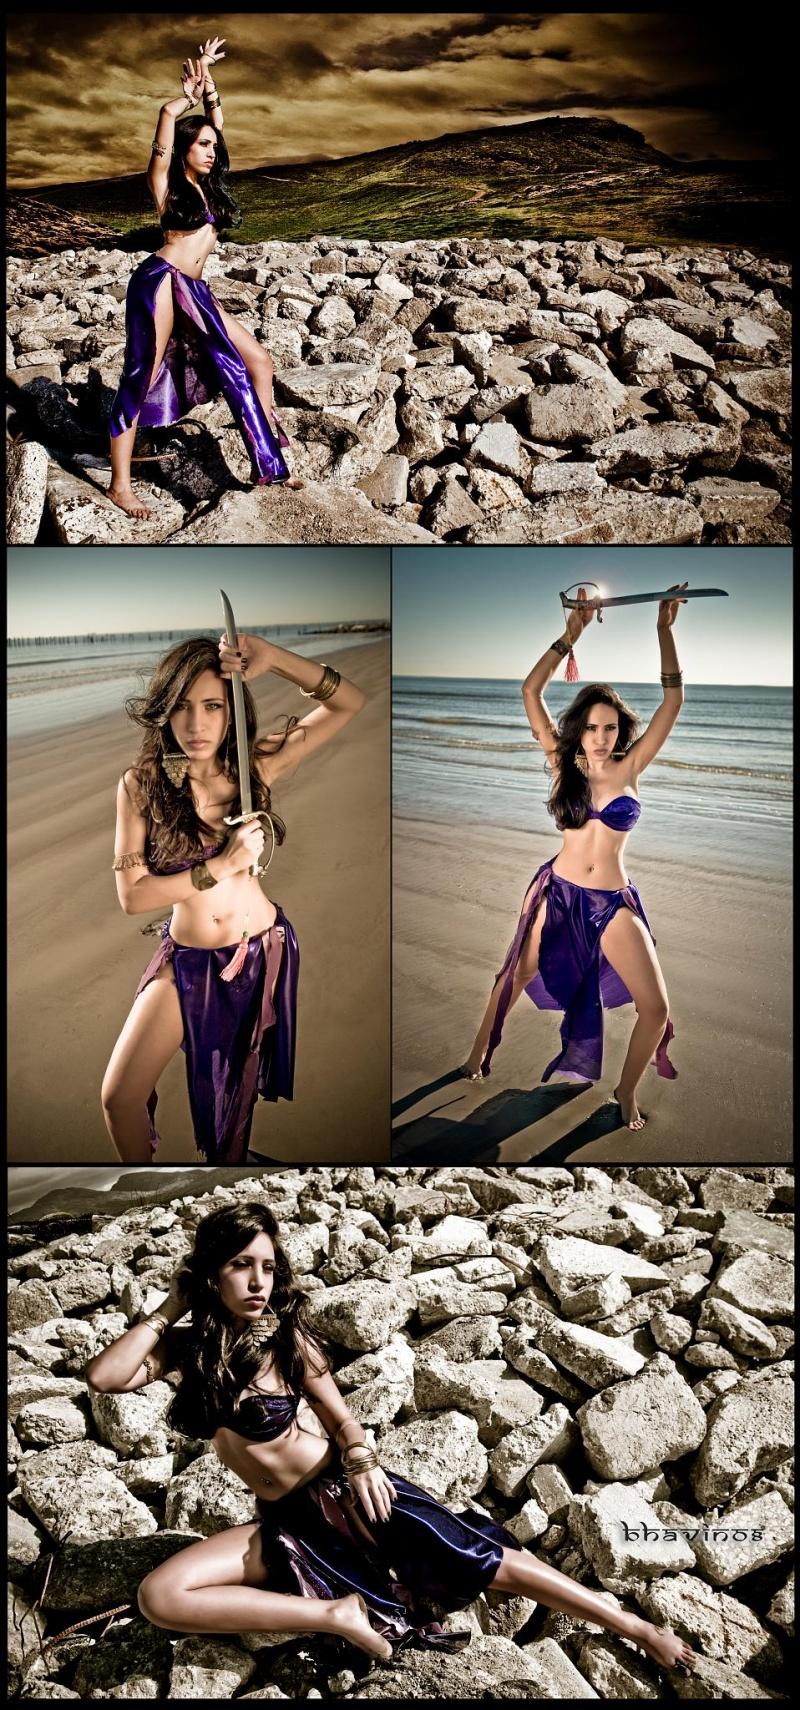 Dec 18, 2008 ©Bhavin08 Warrior Goddess